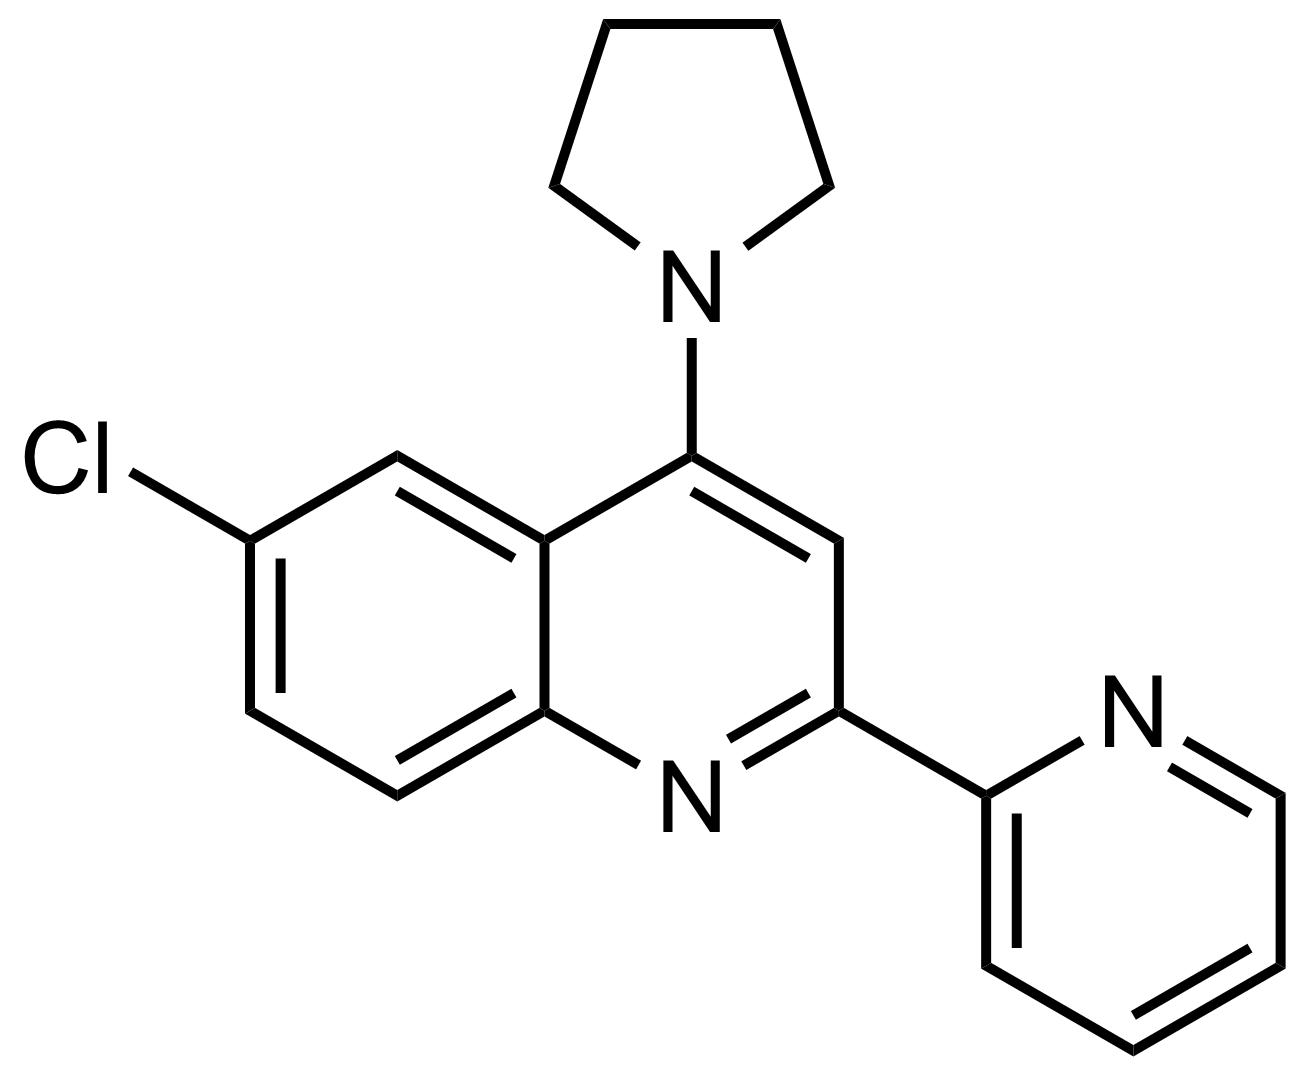 Structure of 6-Chloro-2-(pyridin-2-yl)-4-(pyrrolidin-1-yl)quinoline